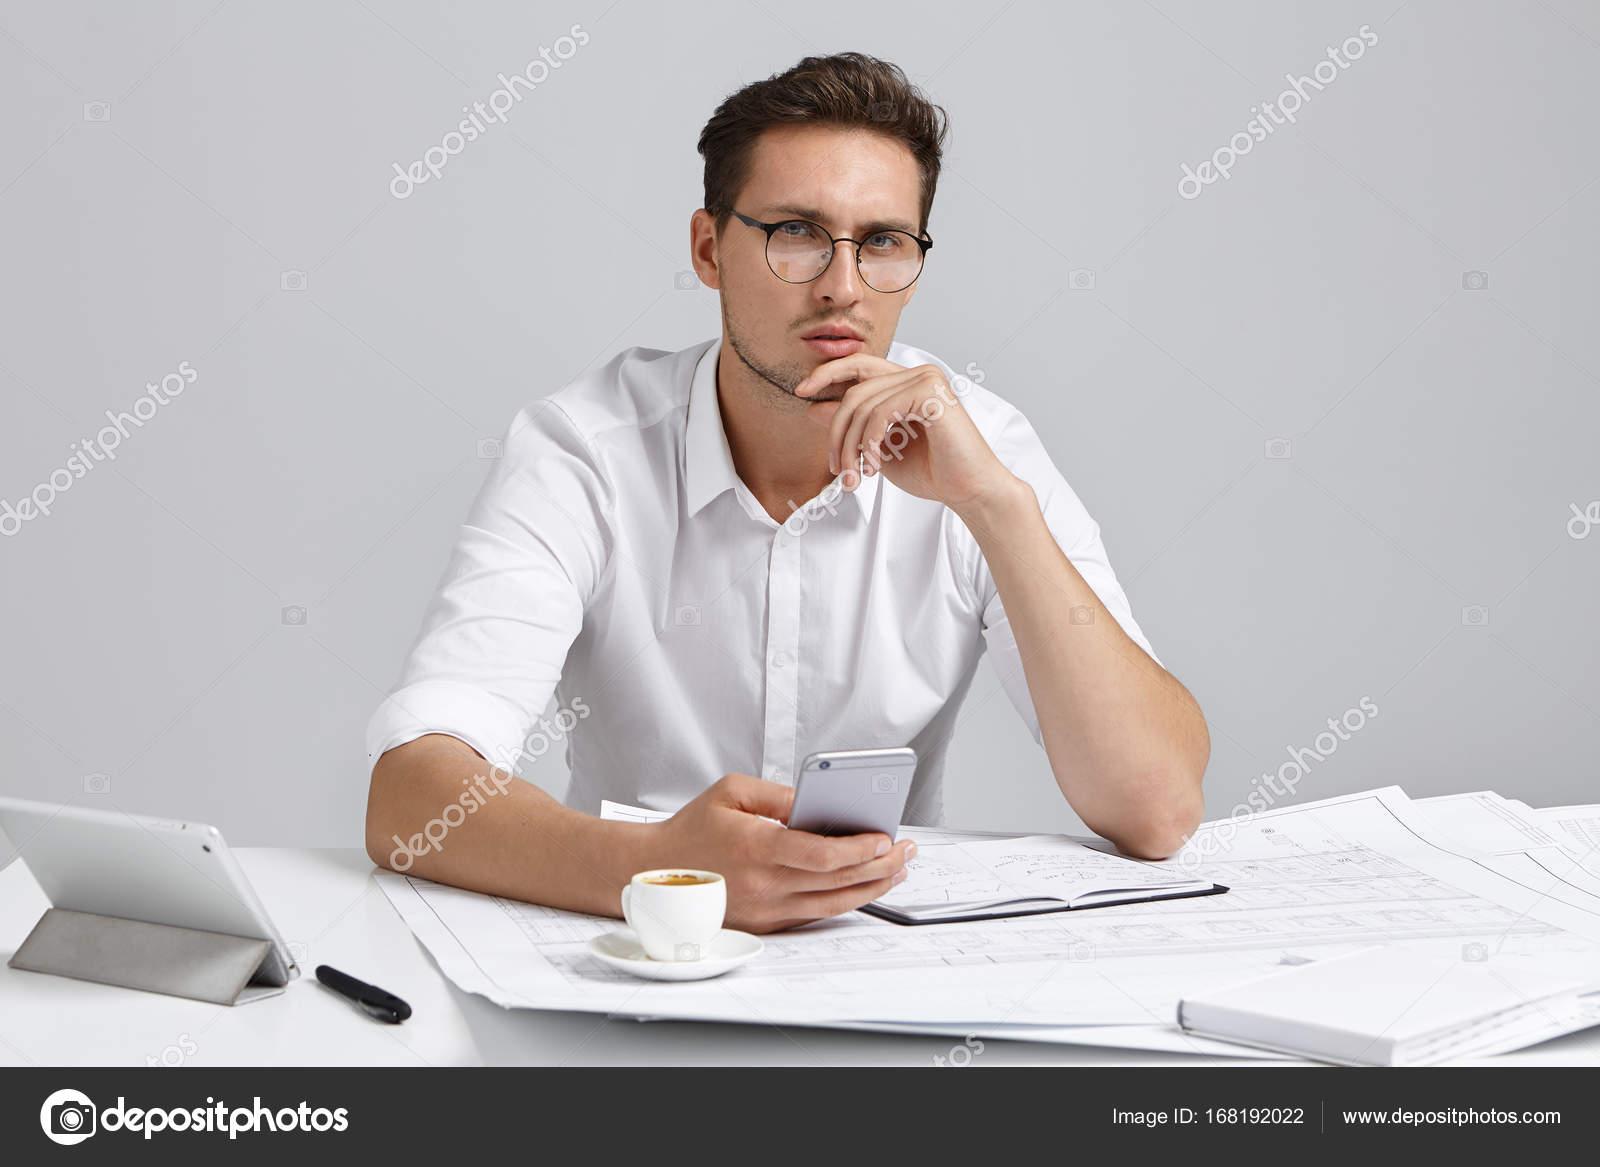 entrepreneur homme barbu assis au bureau photographie avemario 168192022. Black Bedroom Furniture Sets. Home Design Ideas